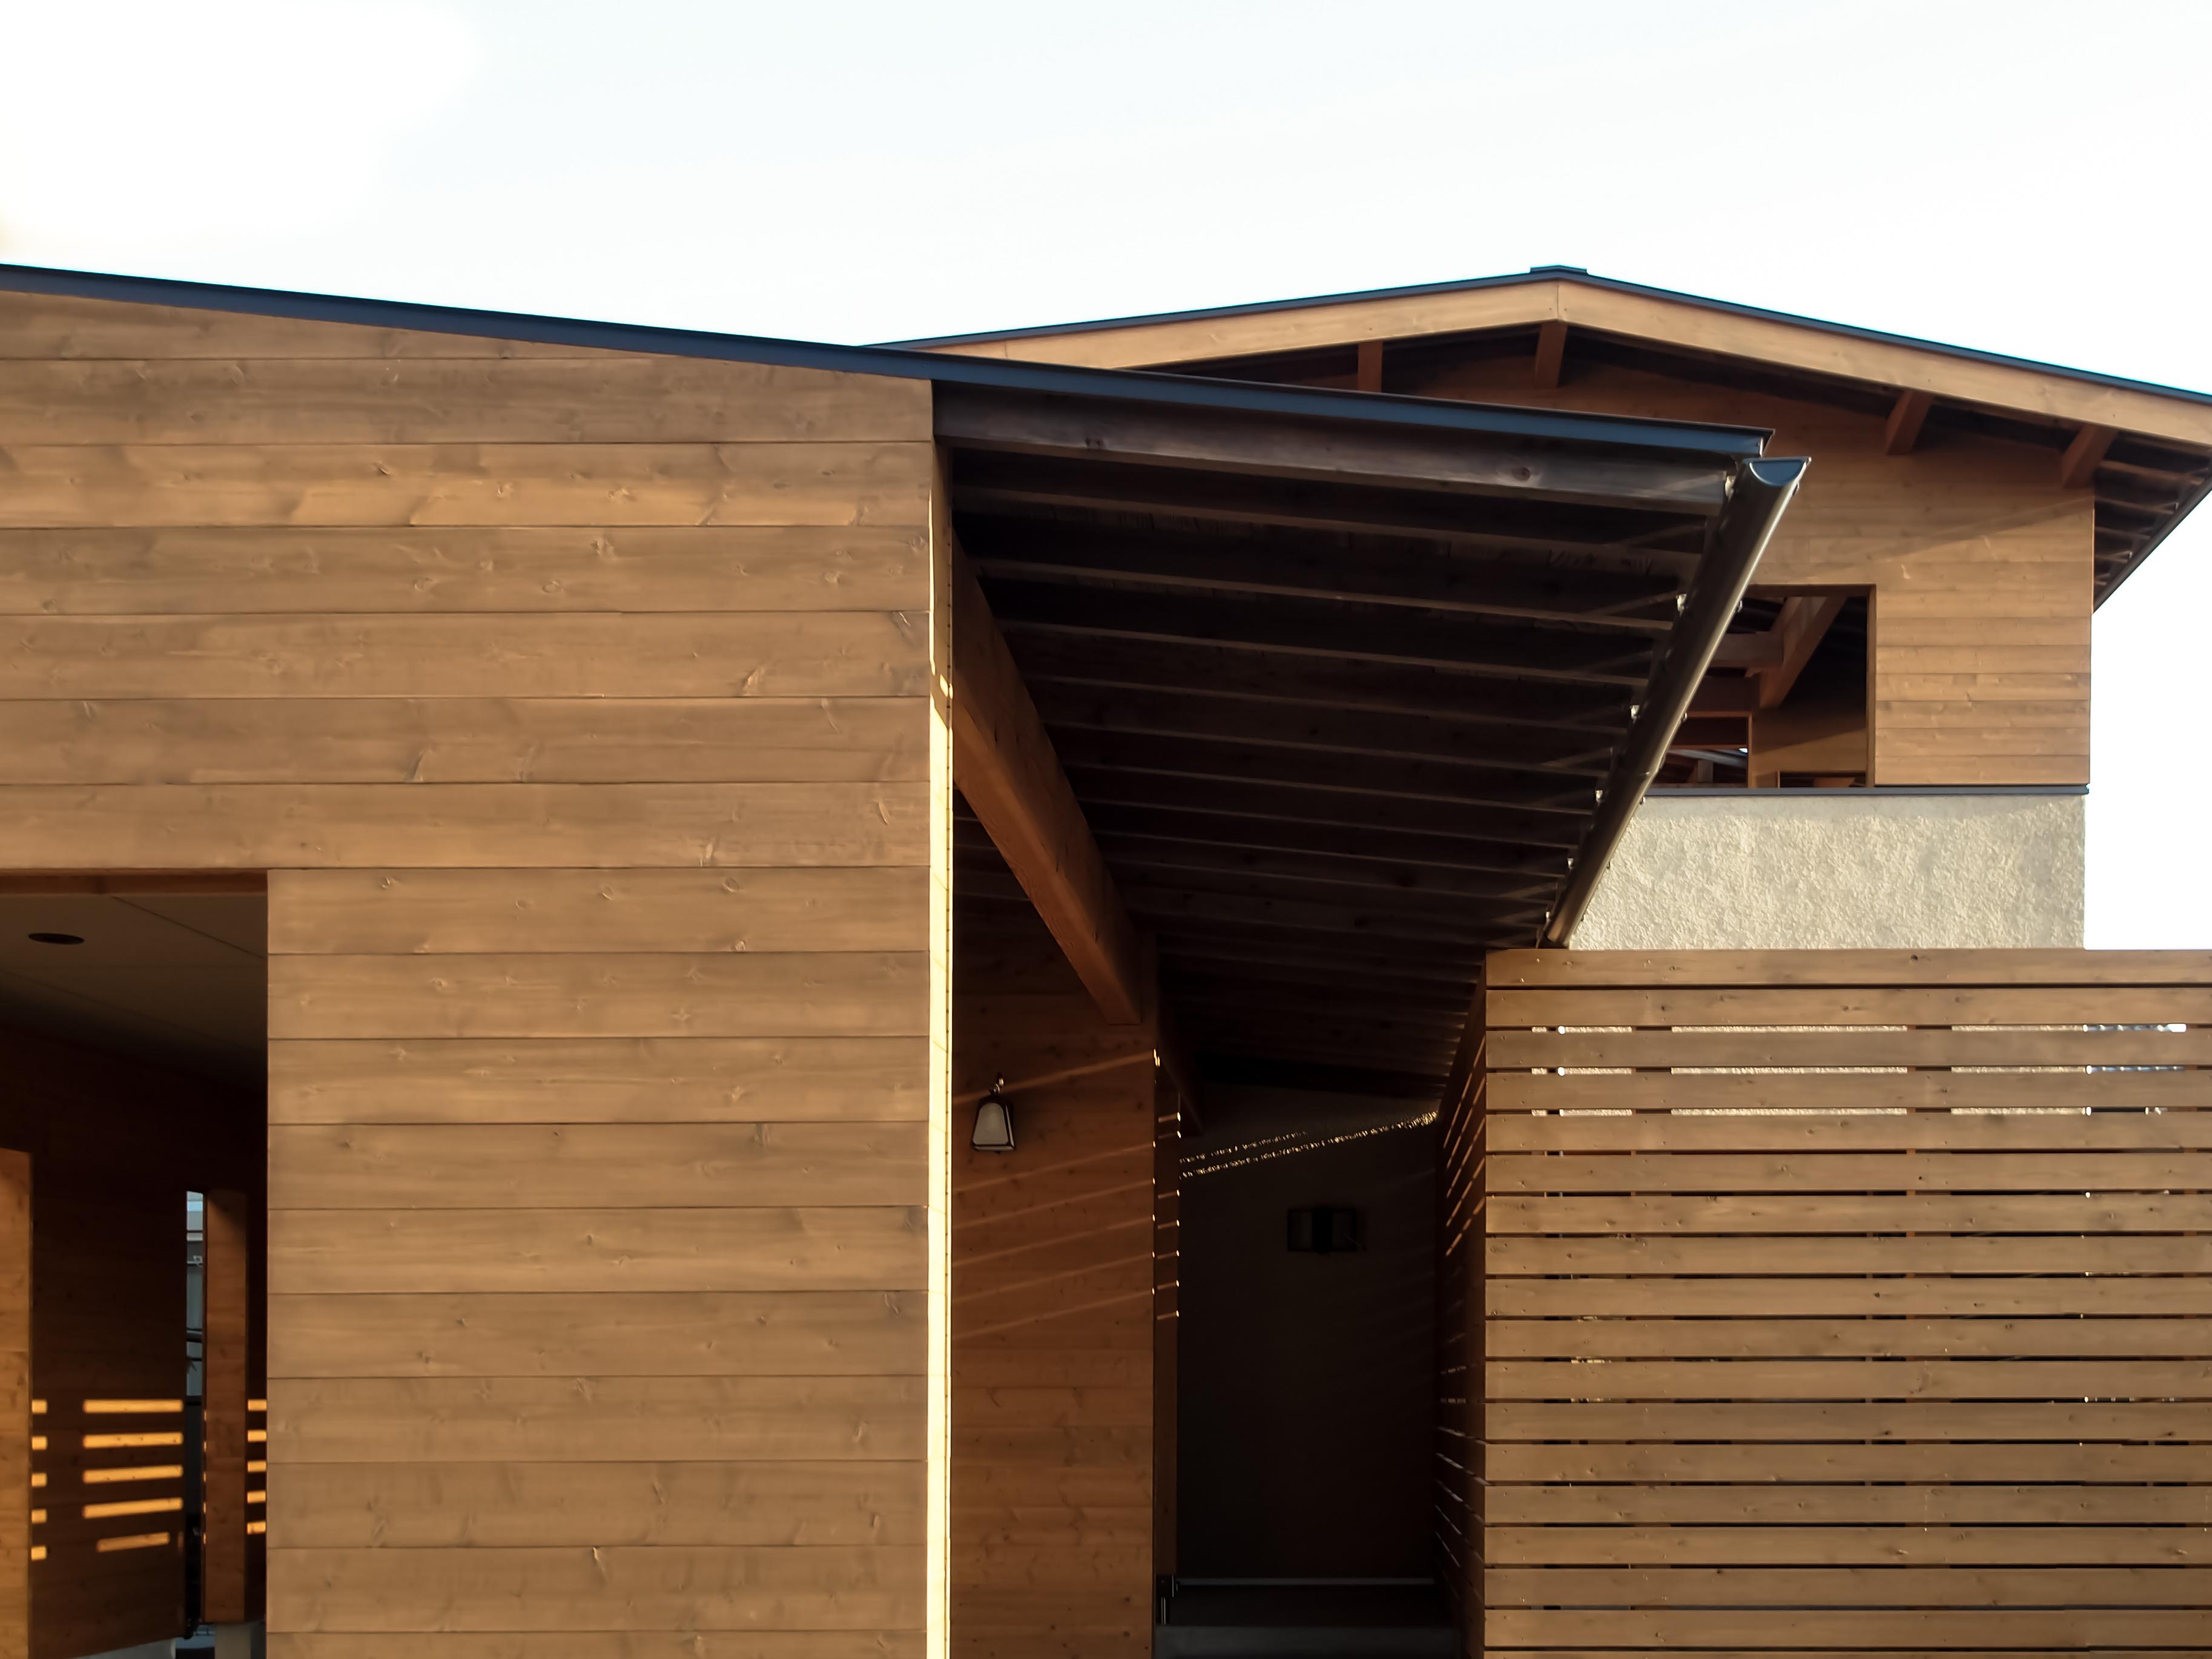 大屋根の家 2014